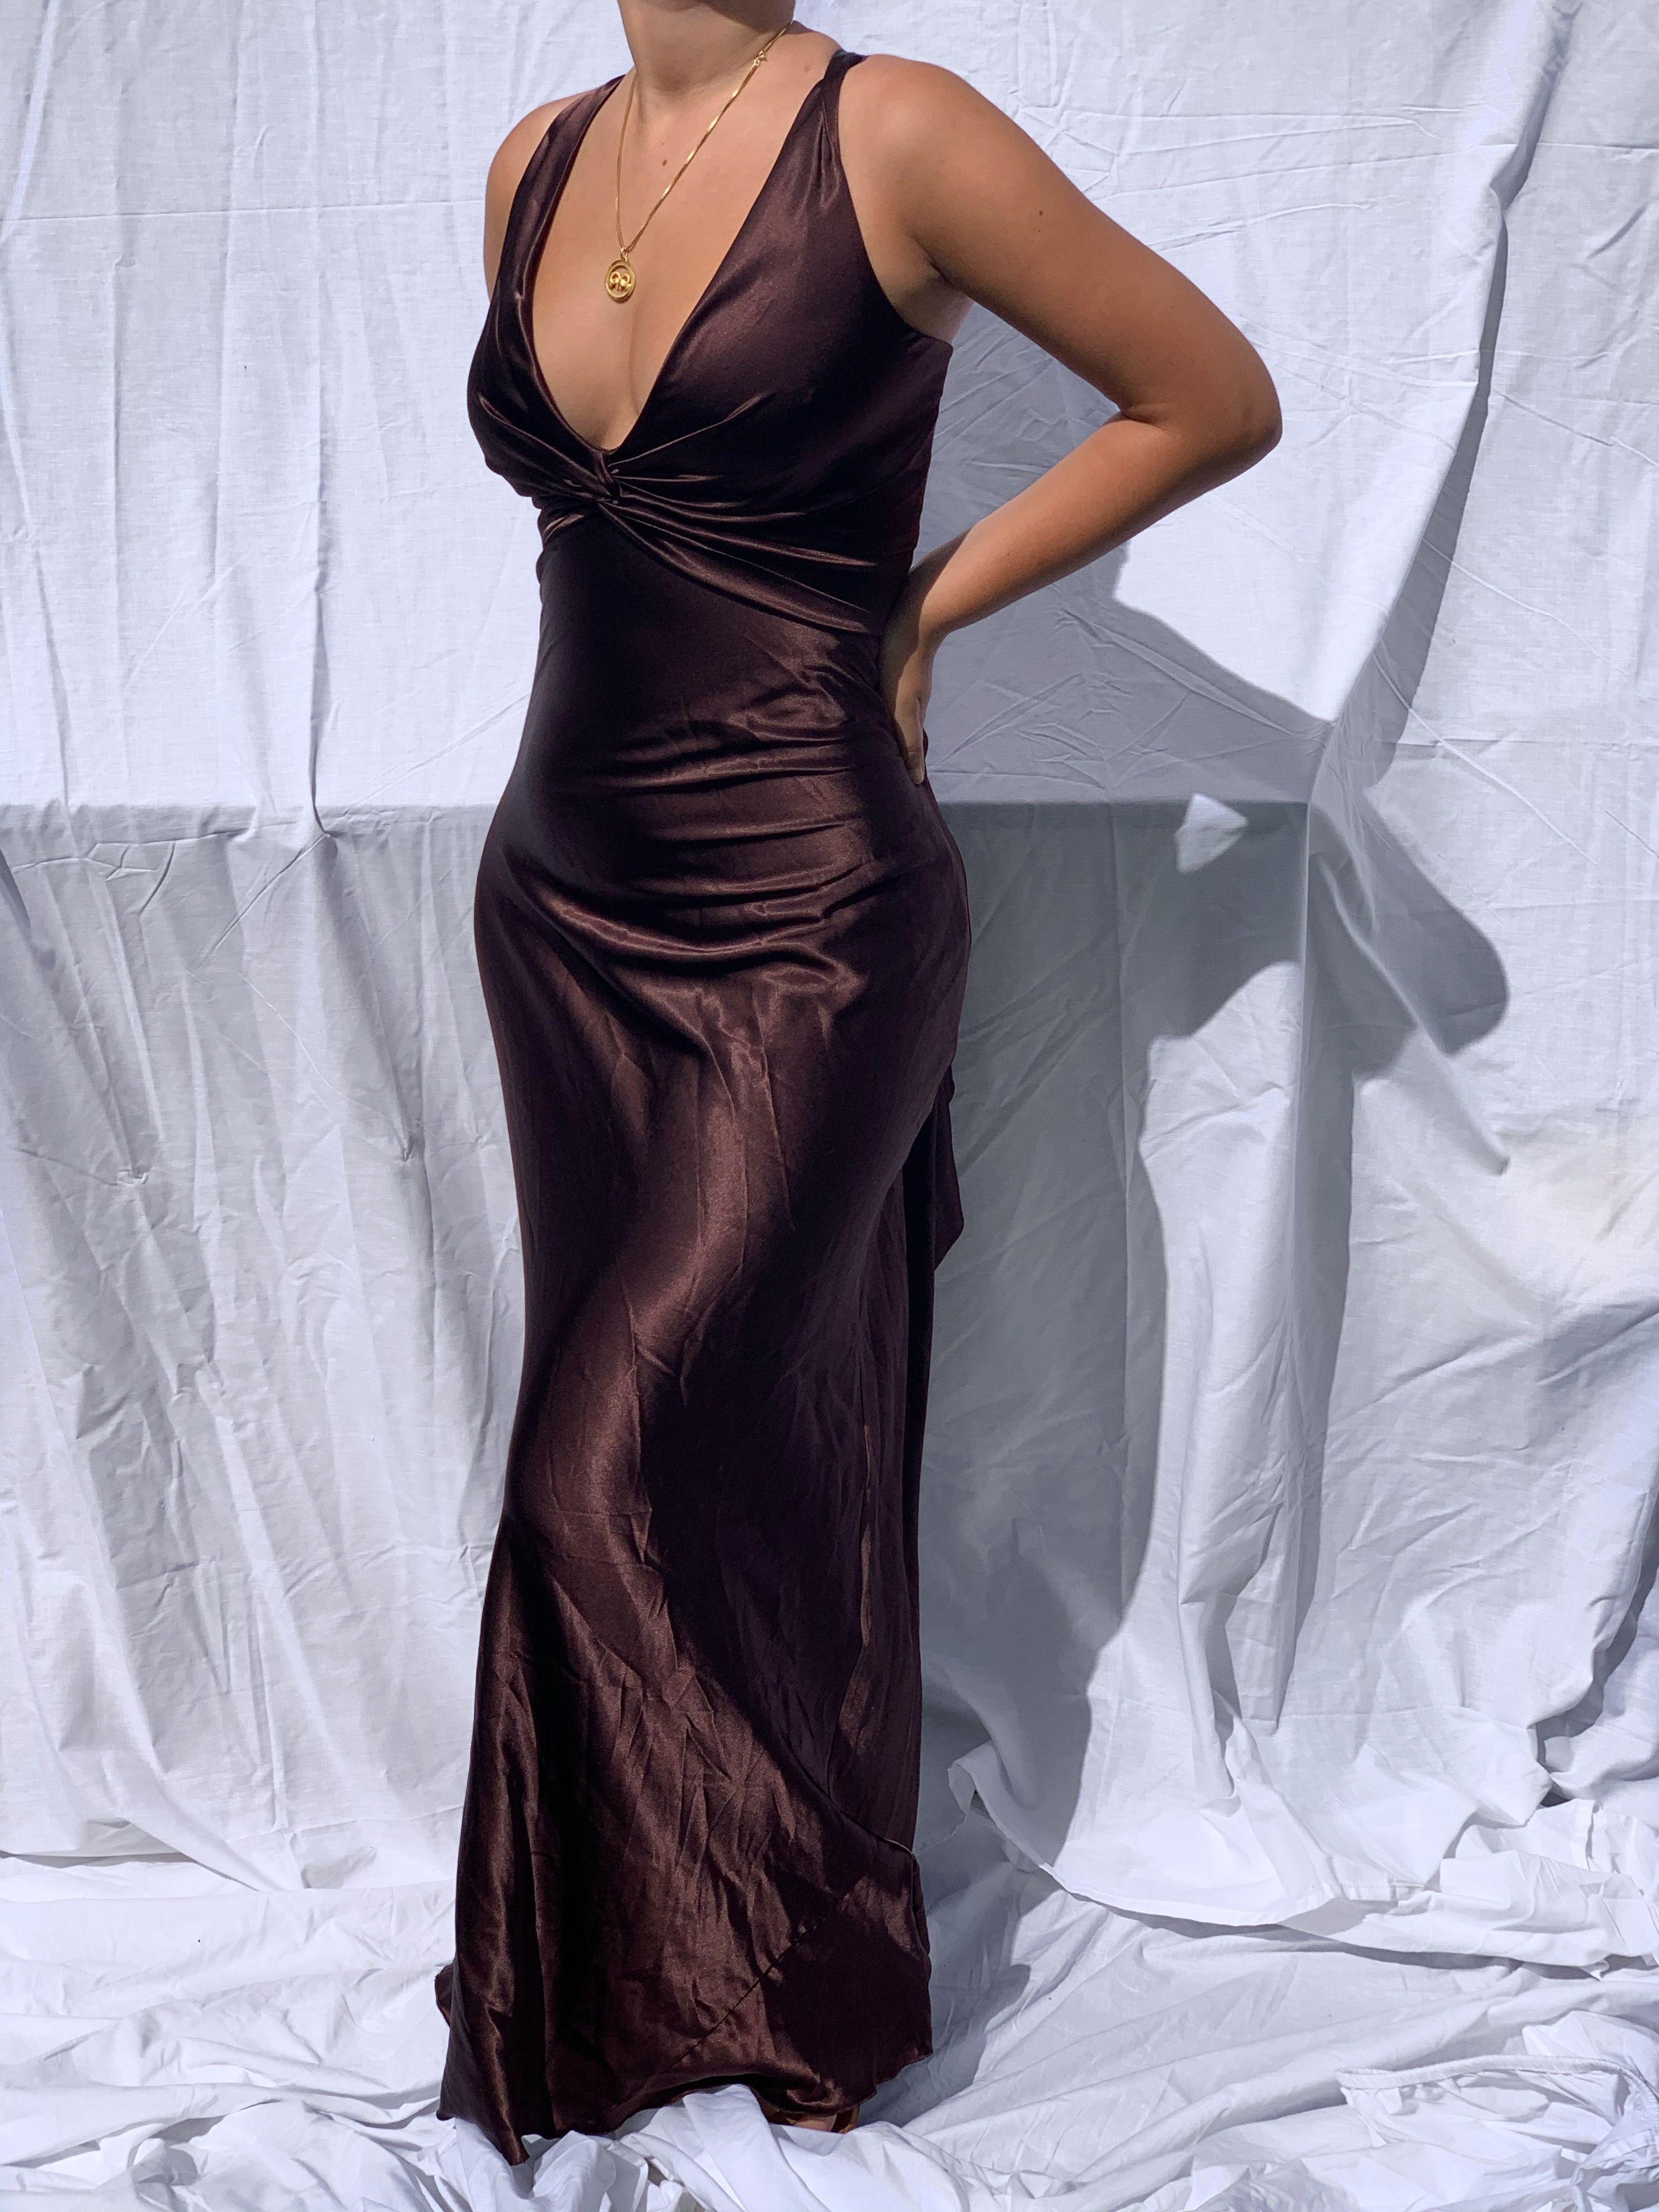 Vintage Formal Dress Silk Dress 90s Prom Prom Dresses Y2k Formal Buffyvintage Brown Silk Prom Dresses Vintage Ball Dresses 90s Prom Dresses [ 4032 x 3024 Pixel ]